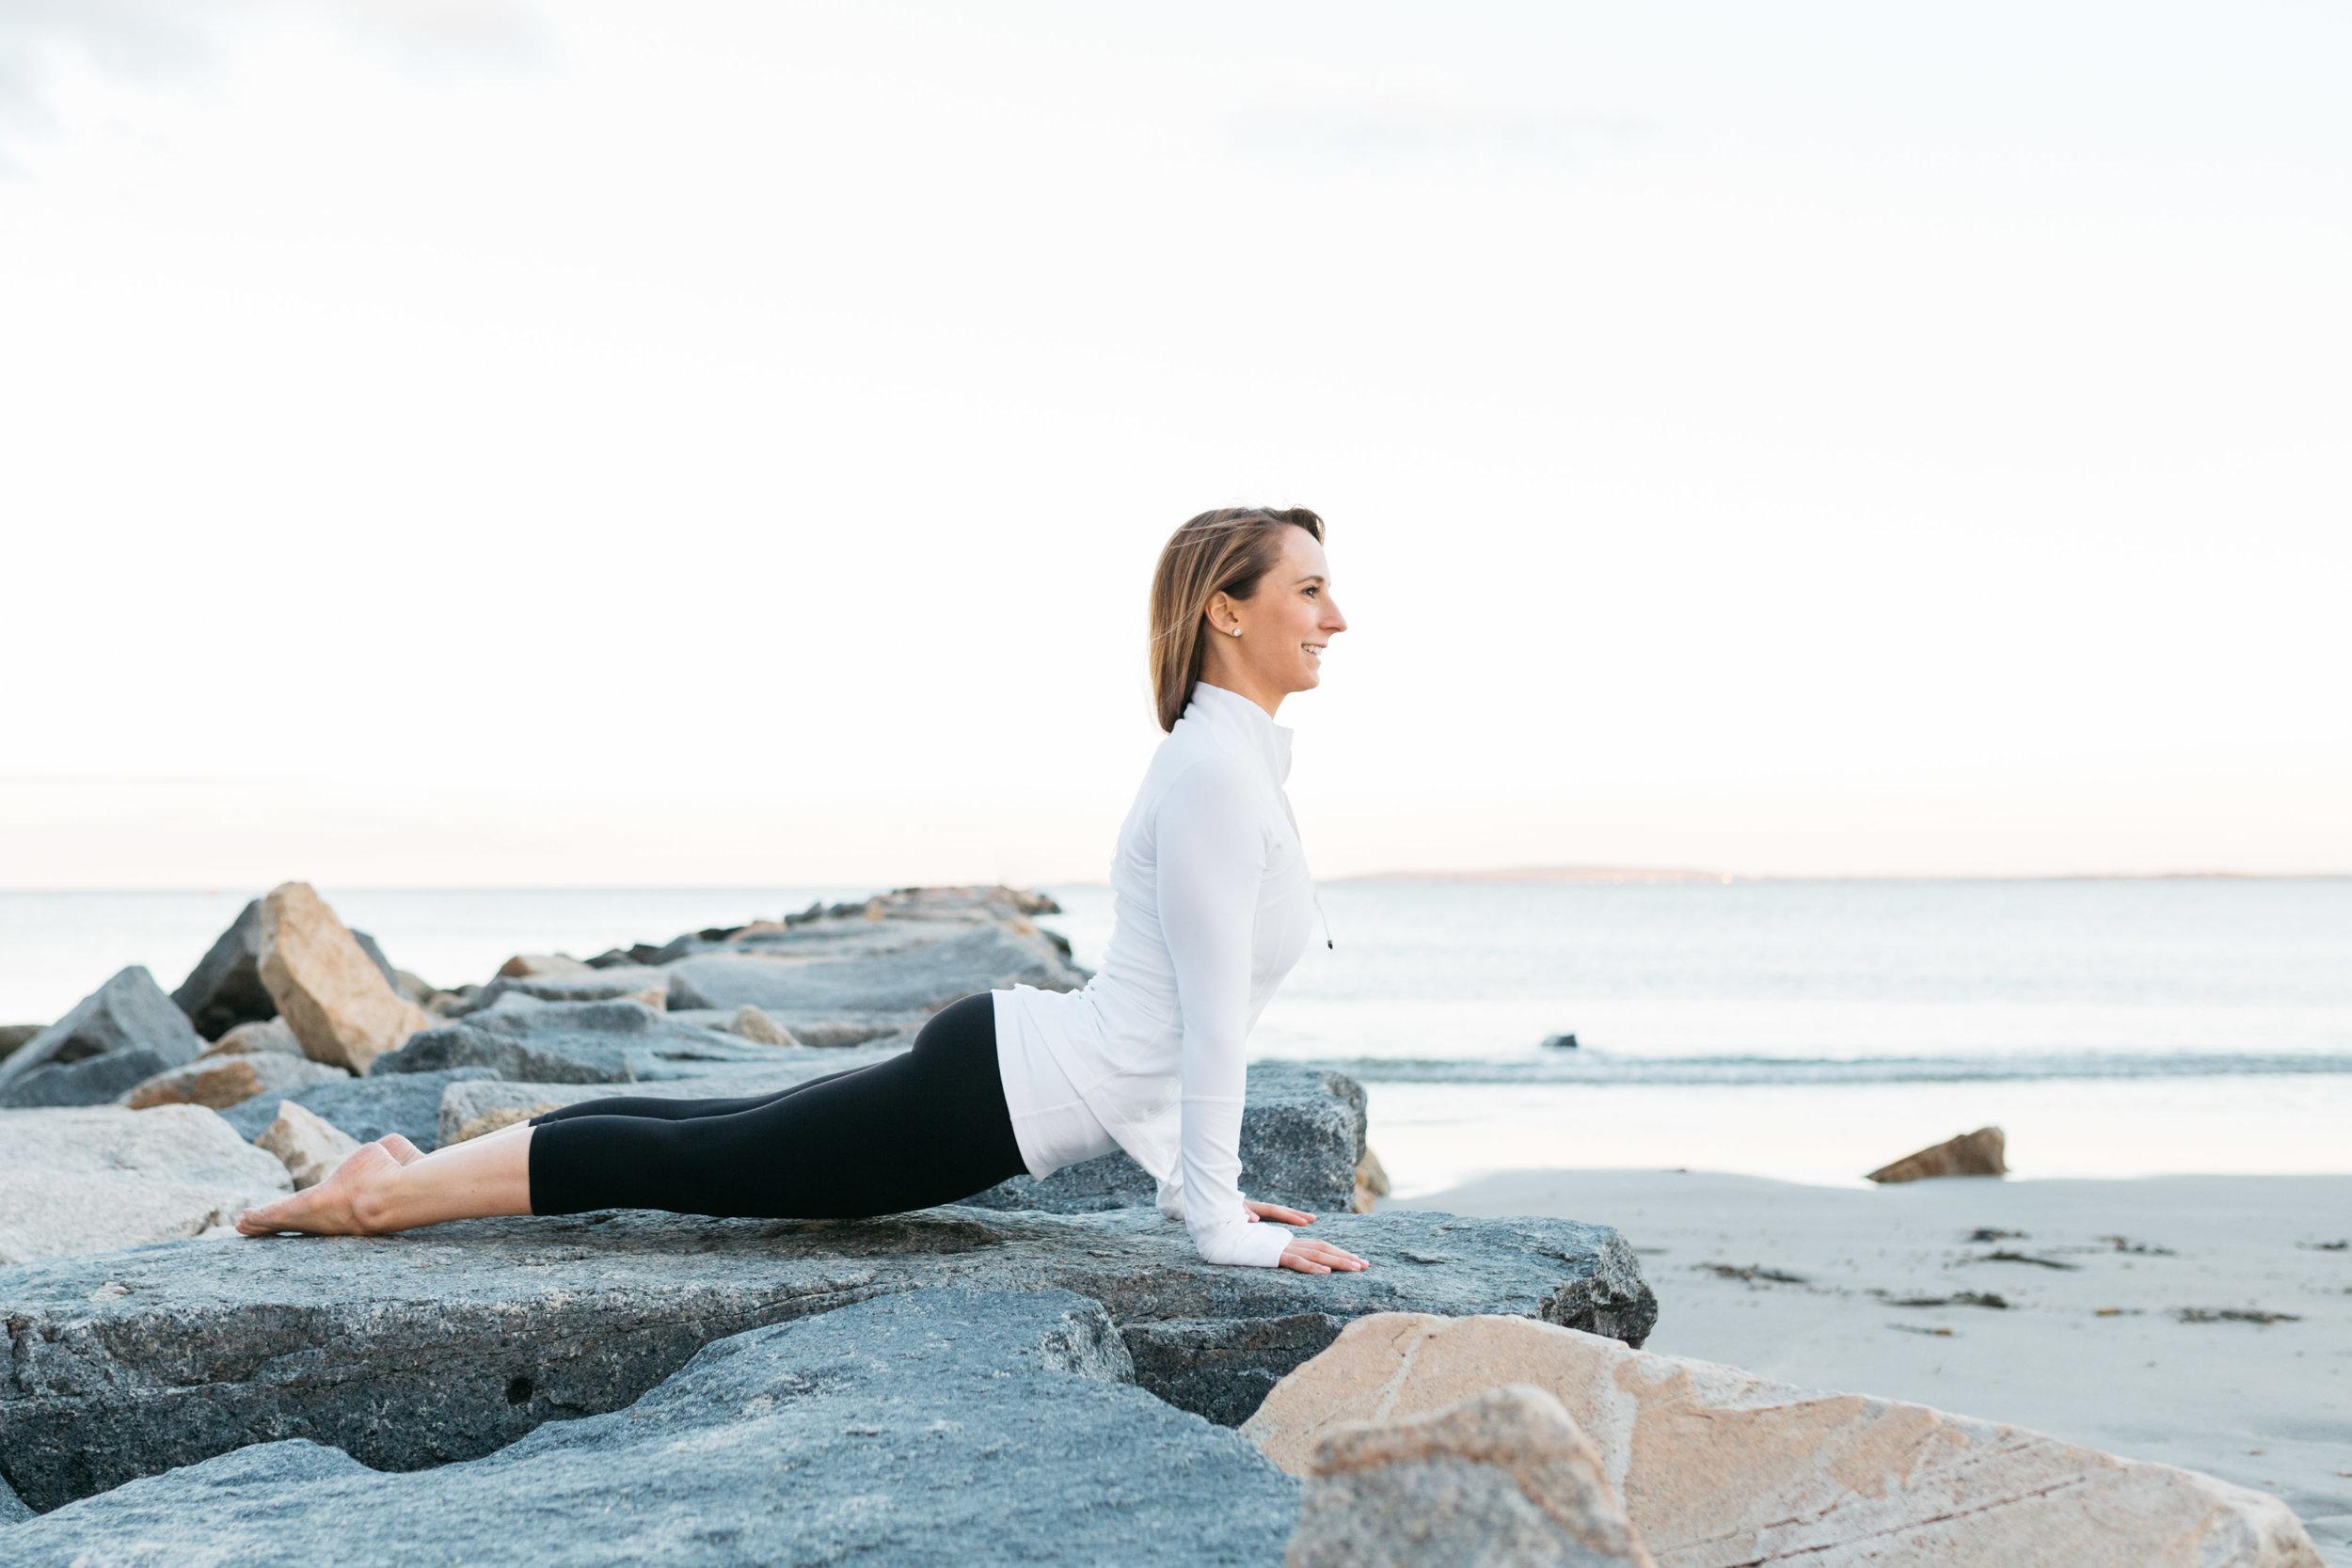 boston-yoga-photographer-kerry-16.jpg